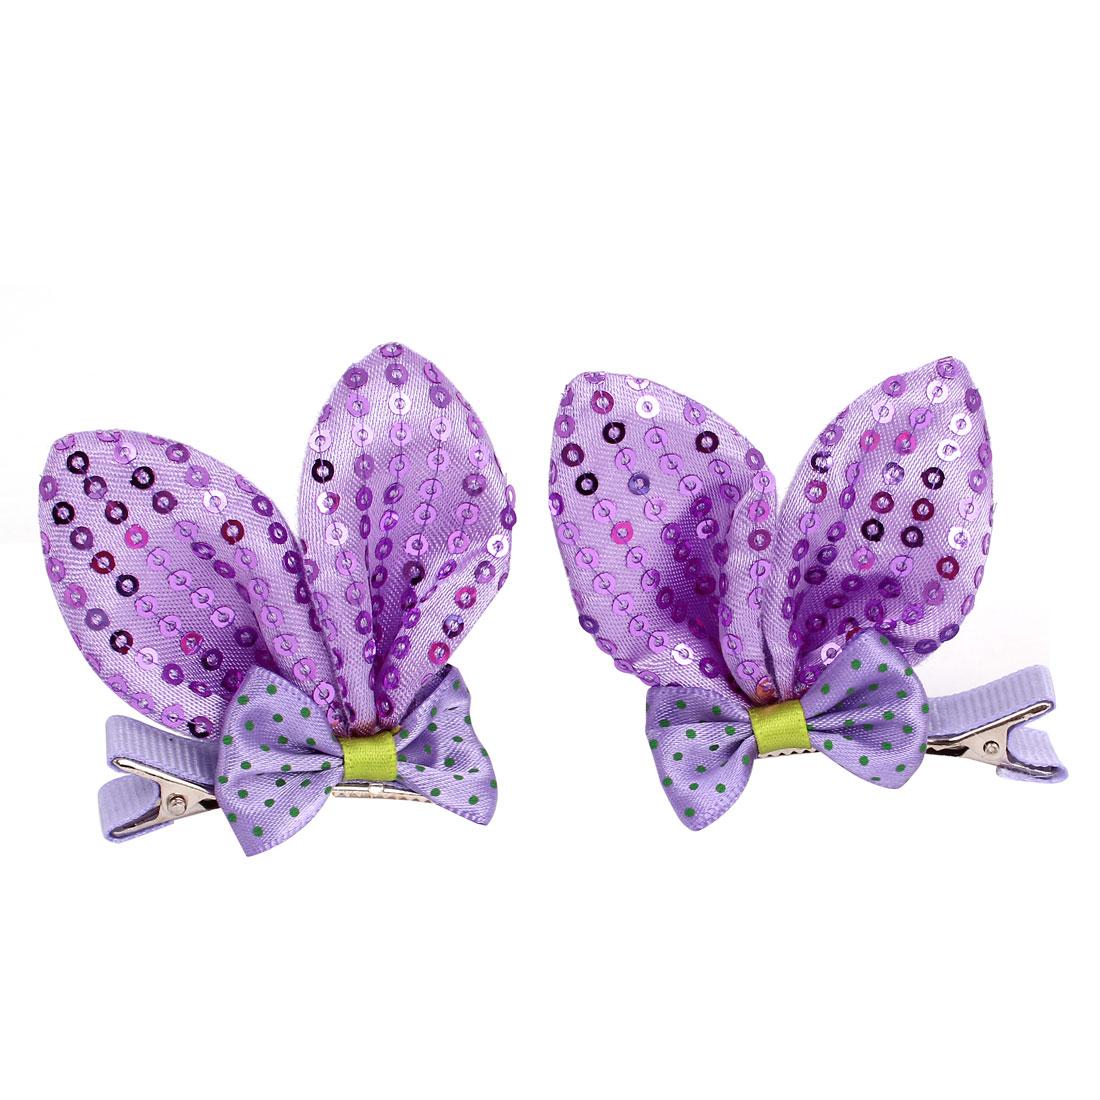 Girl Nylon Sequins Rabbit Ear Bowknot Ornament Hair Clip Purple 2 Pcs